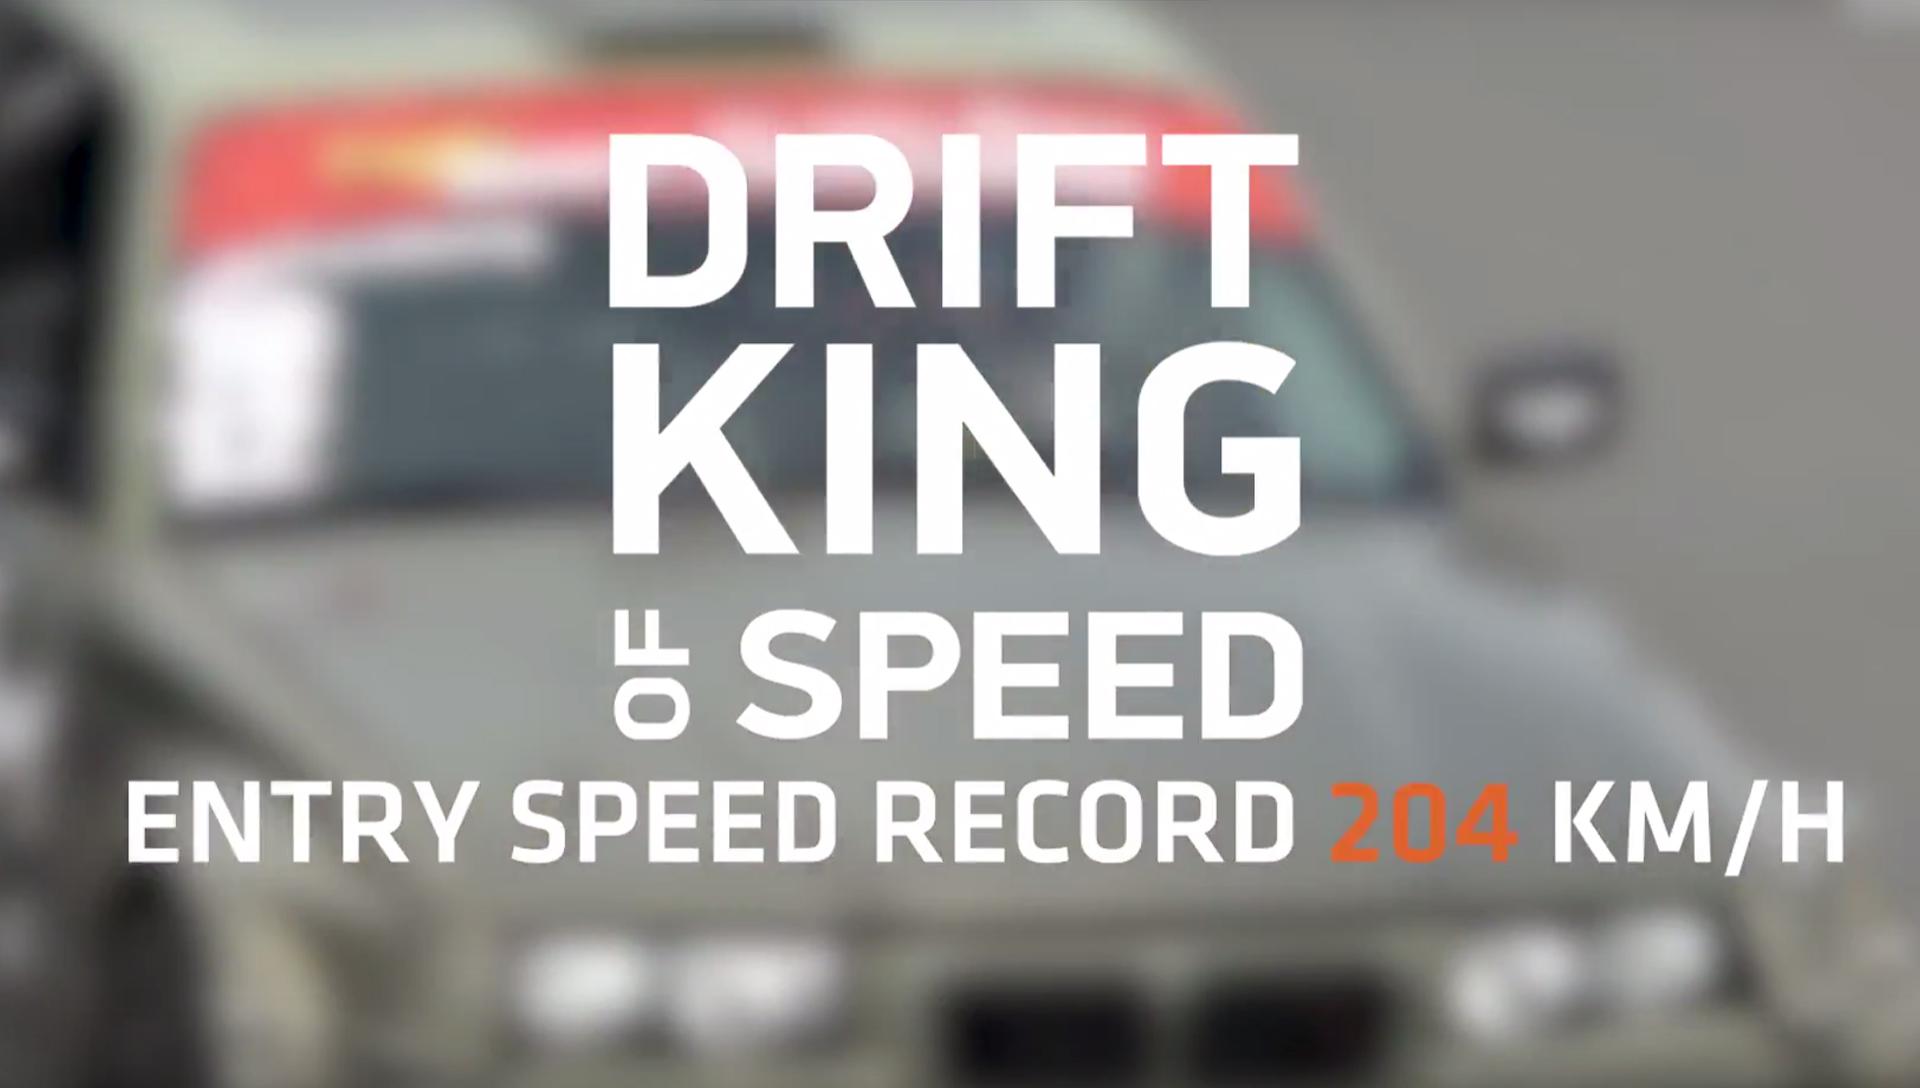 DRIFT KING OF SPEED 204 KM/H - KRISTAPS BLUŠS - ENEOS RIGA SUMMER RACE 2017